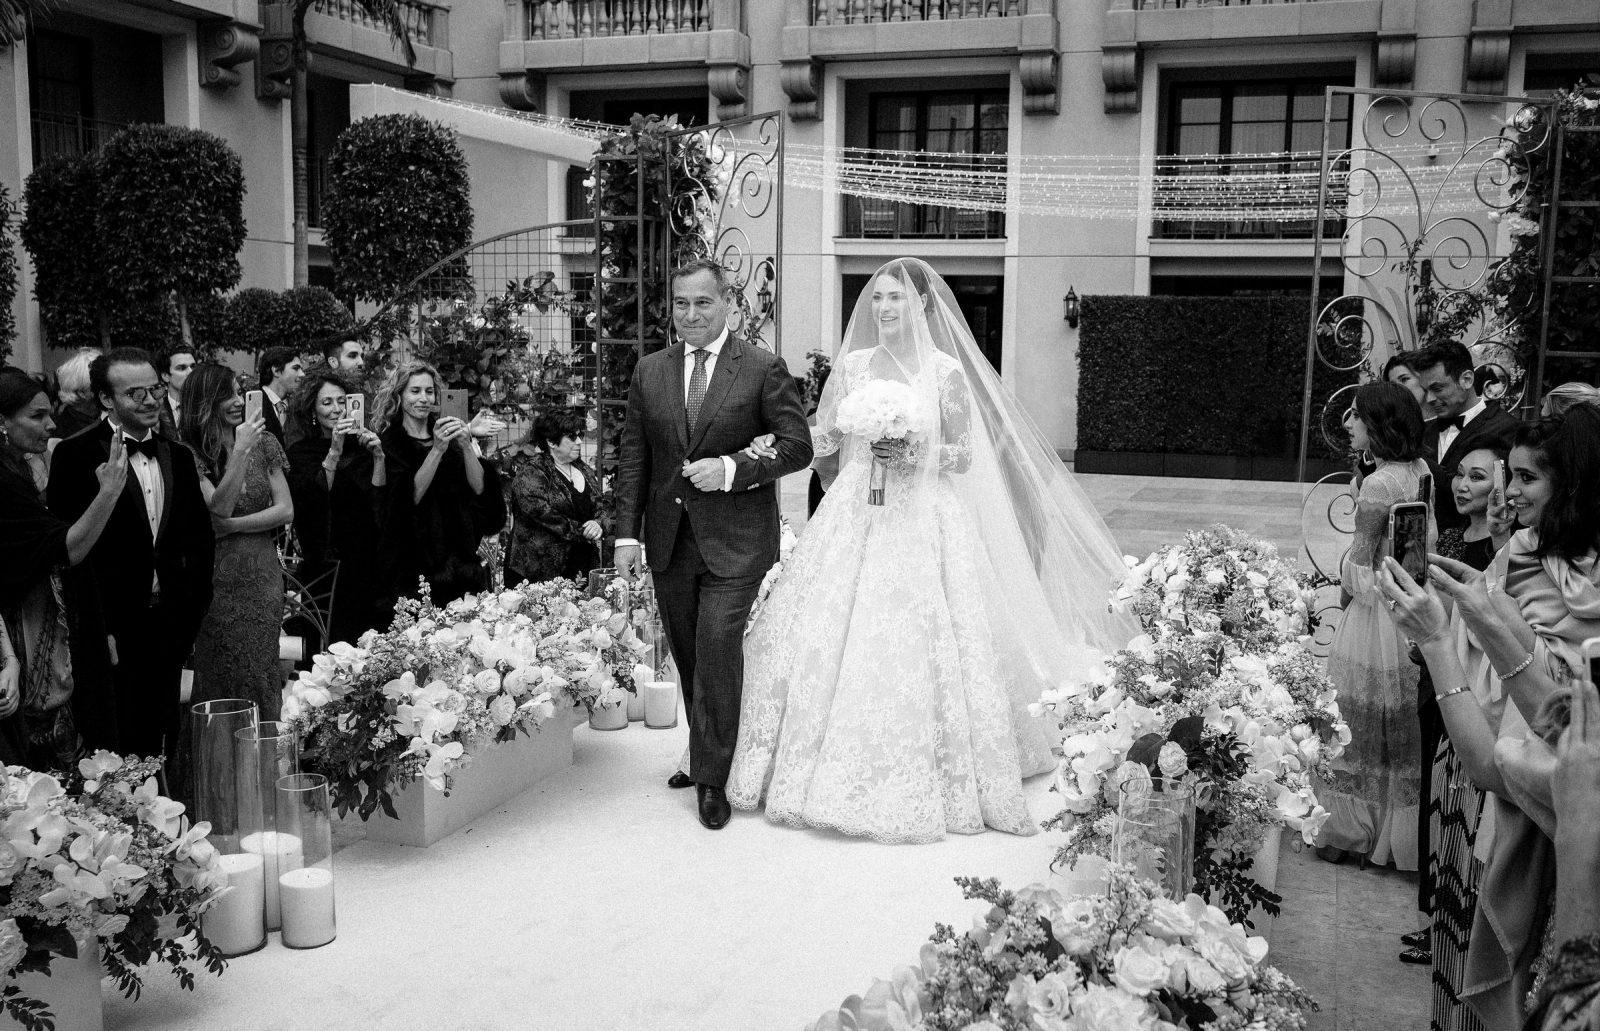 maria-eduardo-montage-beverly-hills-wedding-164.jpg